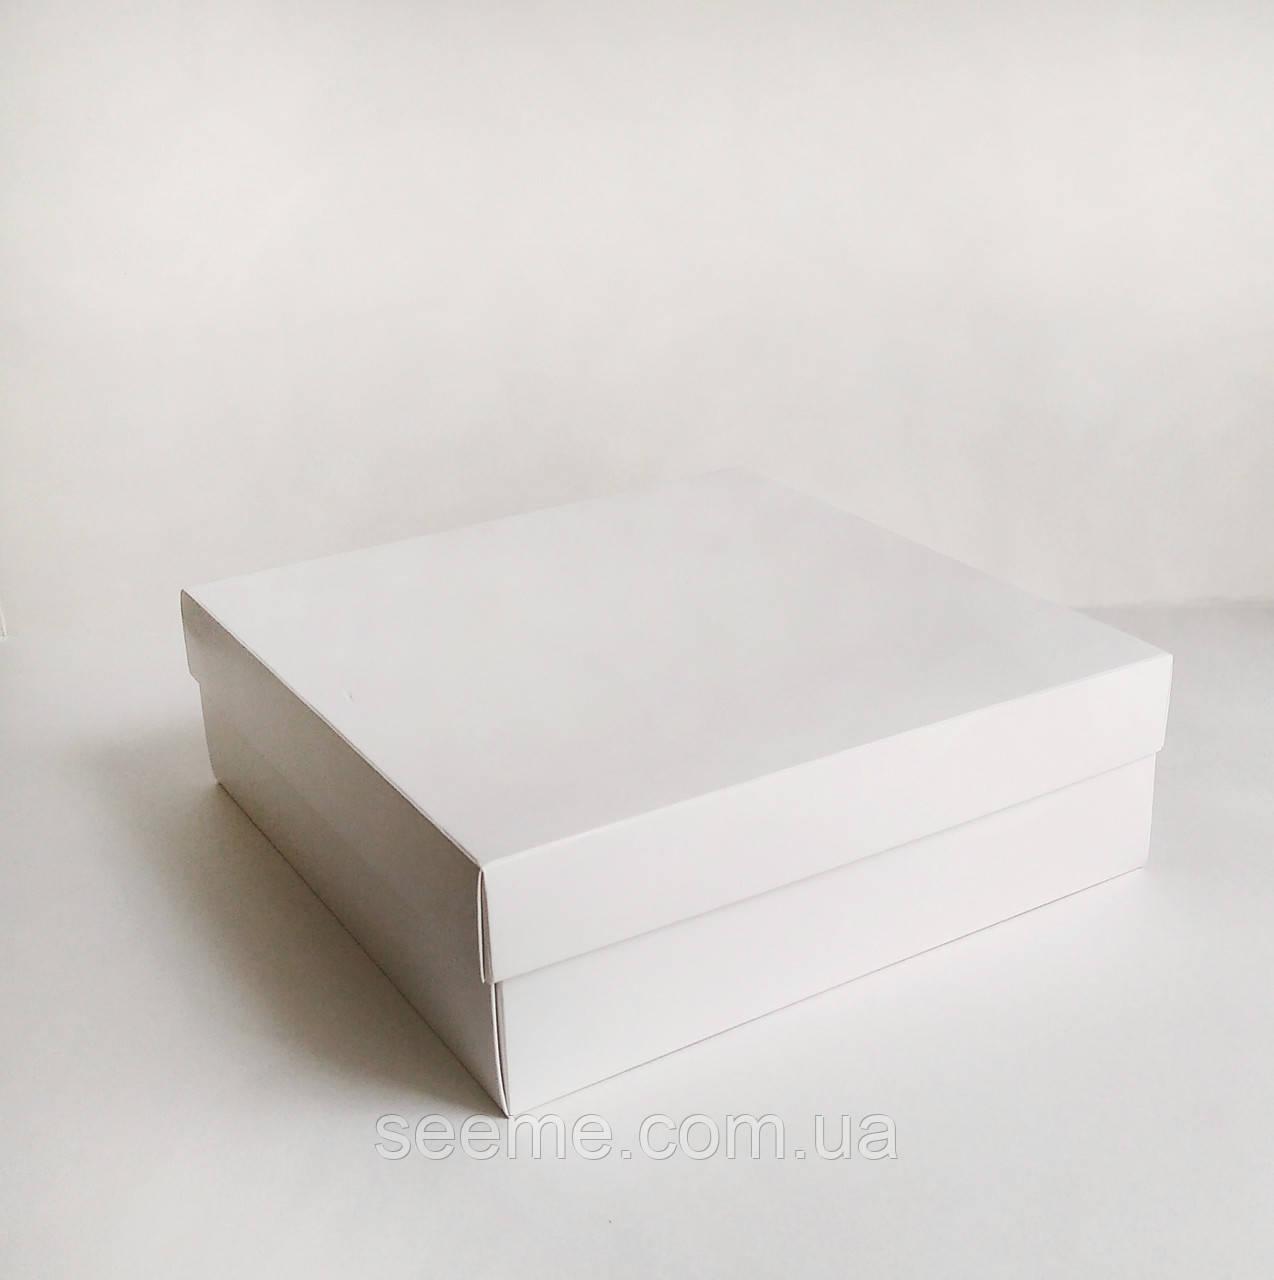 Коробка подарункова, 280х280х90 мм.